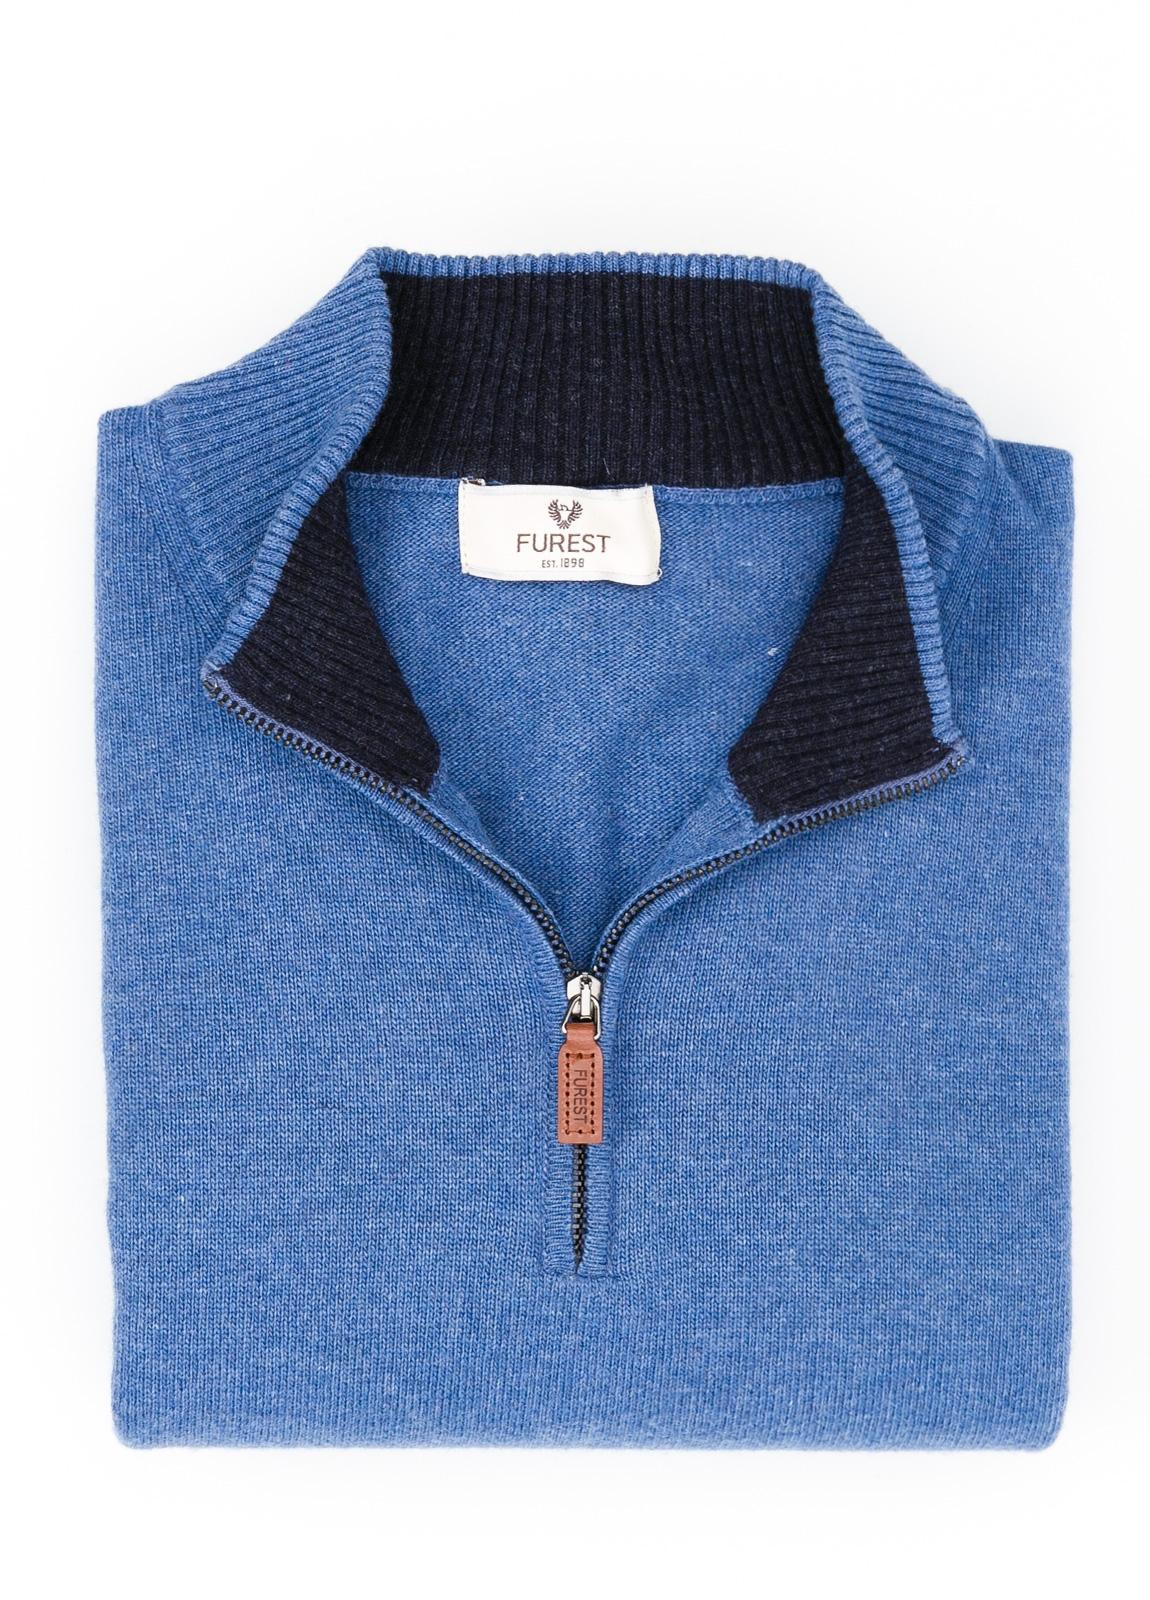 Jersey liso cuello cremallera, color azul, 40% lana merino, 30% viscosa, 10% cachemire - Ítem1